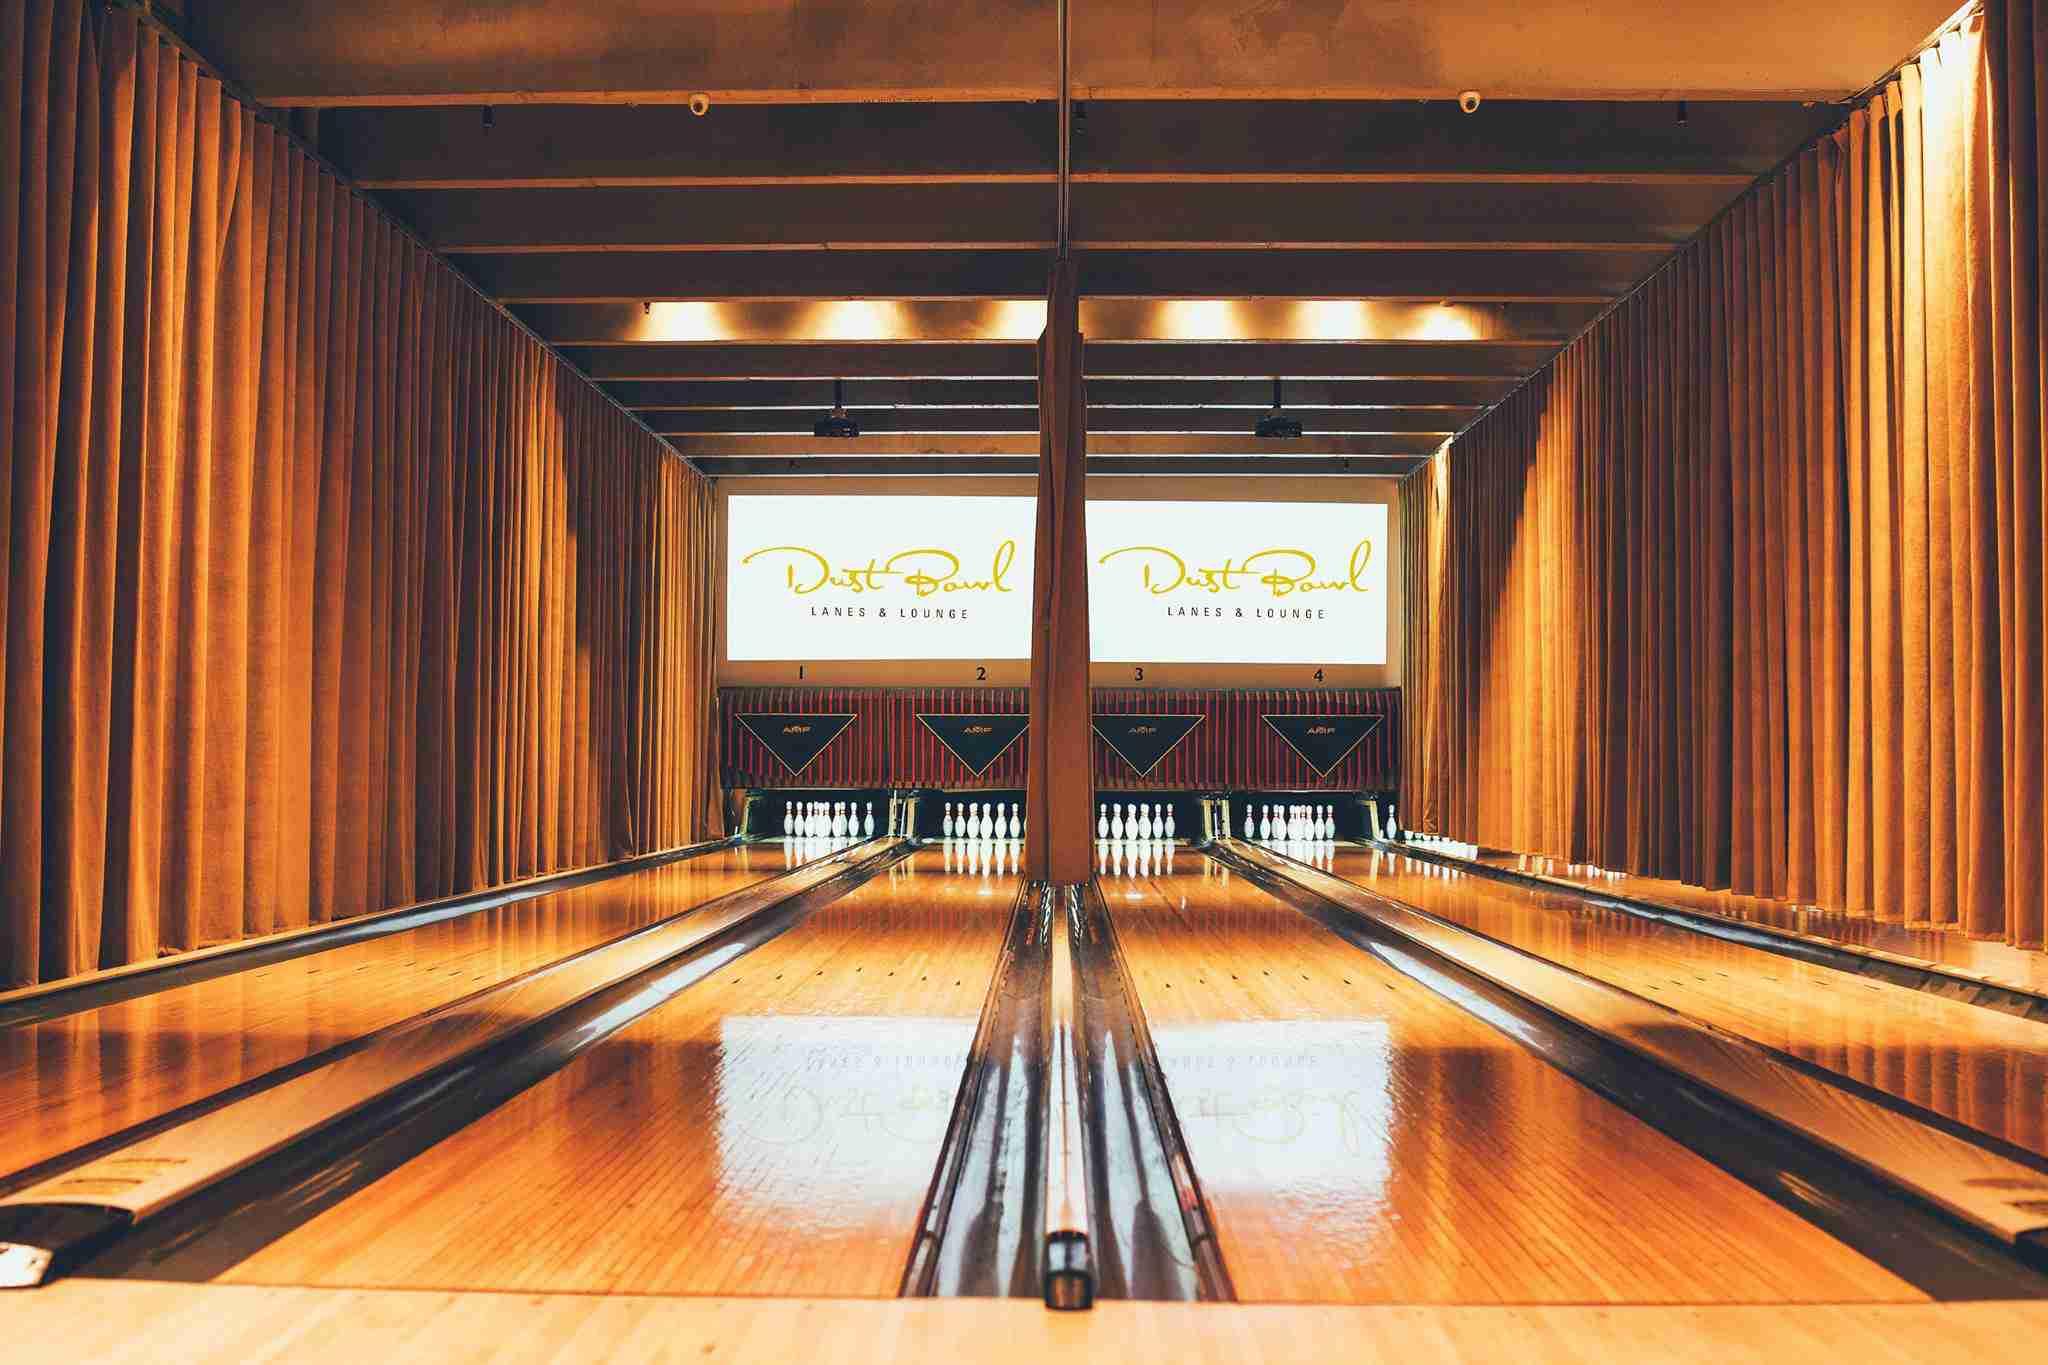 Dust Bowl Lanes & Lounge OKC